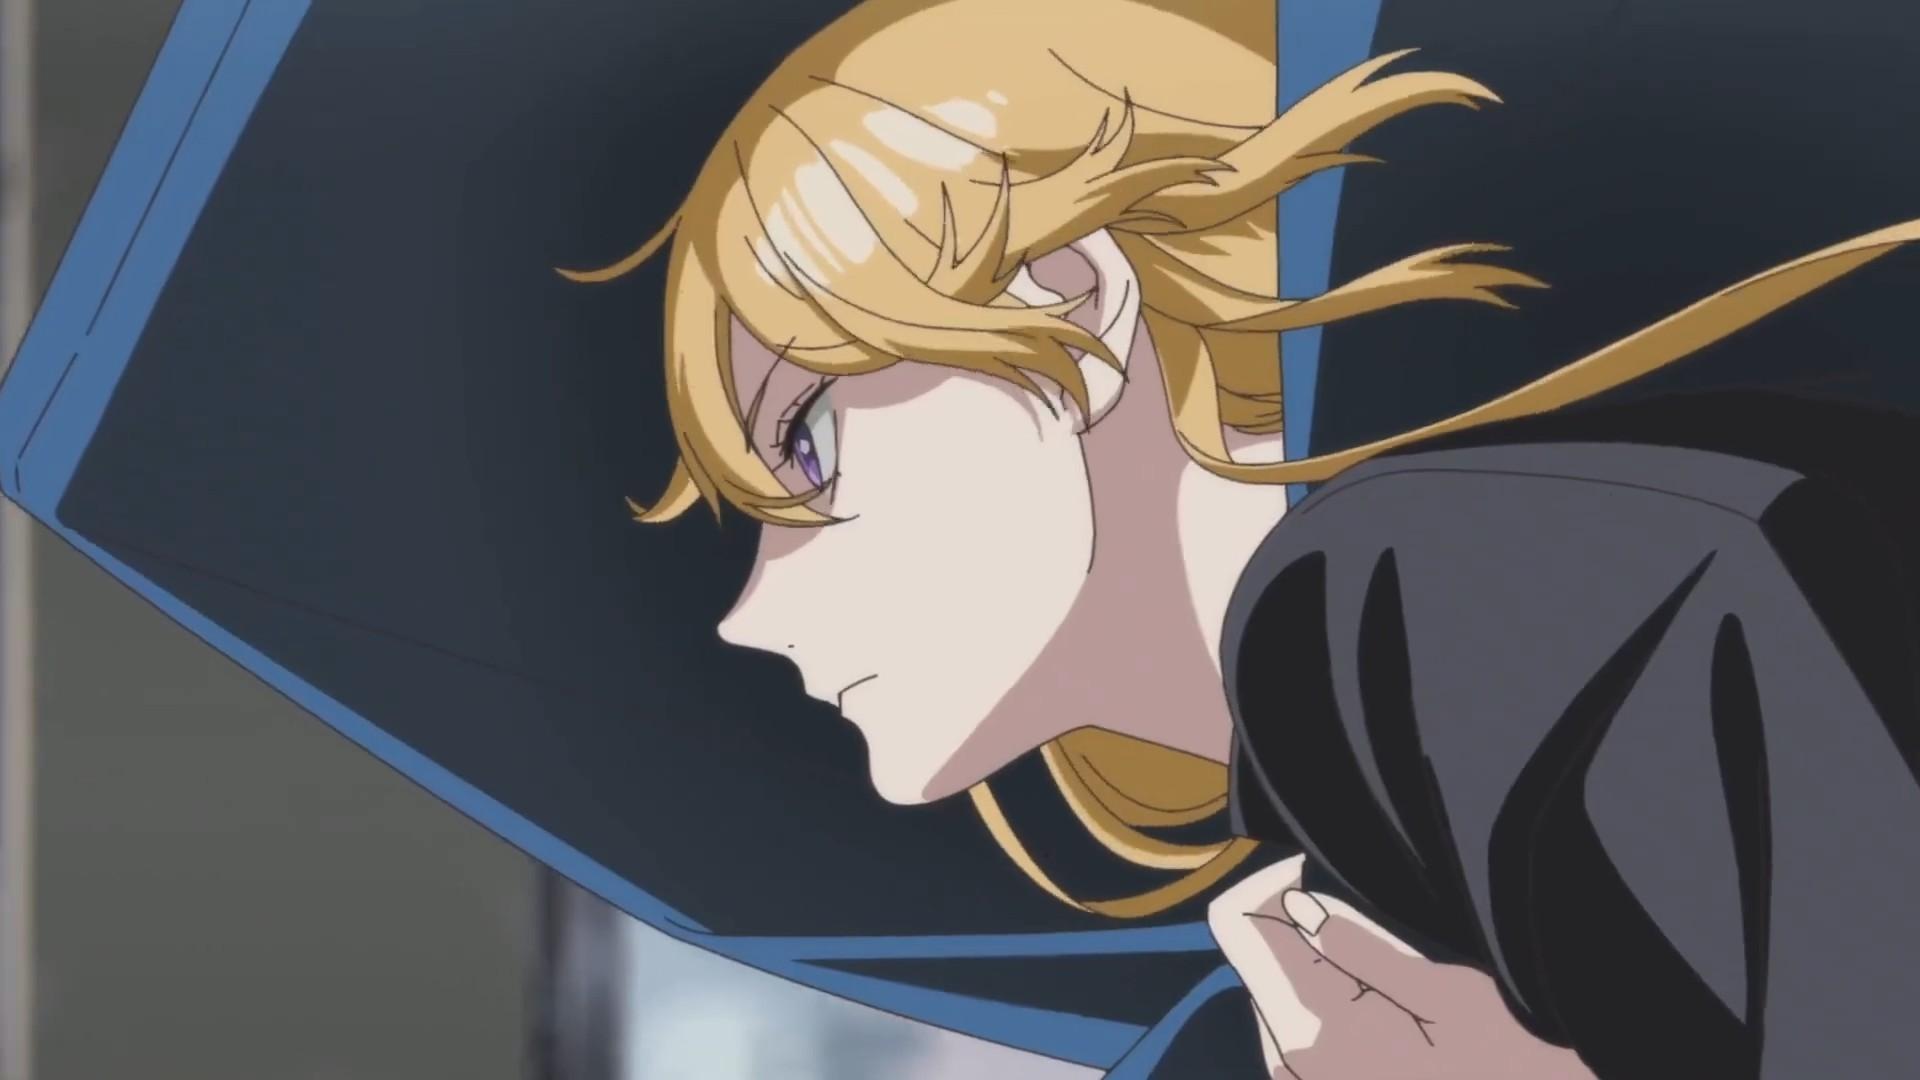 TV动画《蓝色时期》第一弹PV公开,2021年10月播出- ACG17.COM